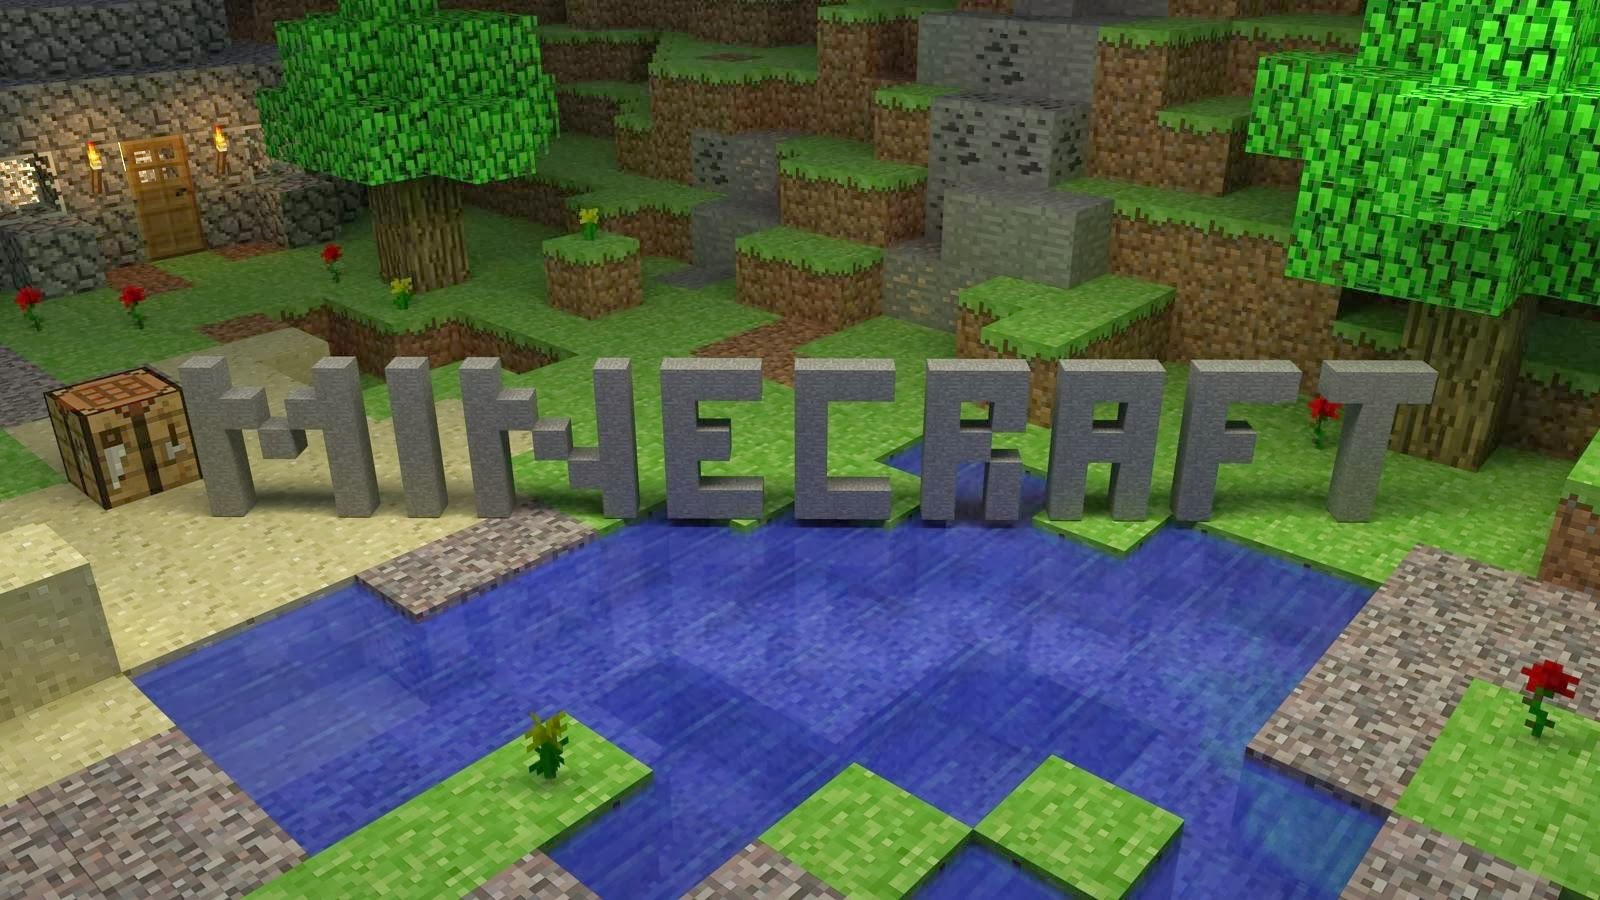 minecraft the nexus wallpaper - photo #31